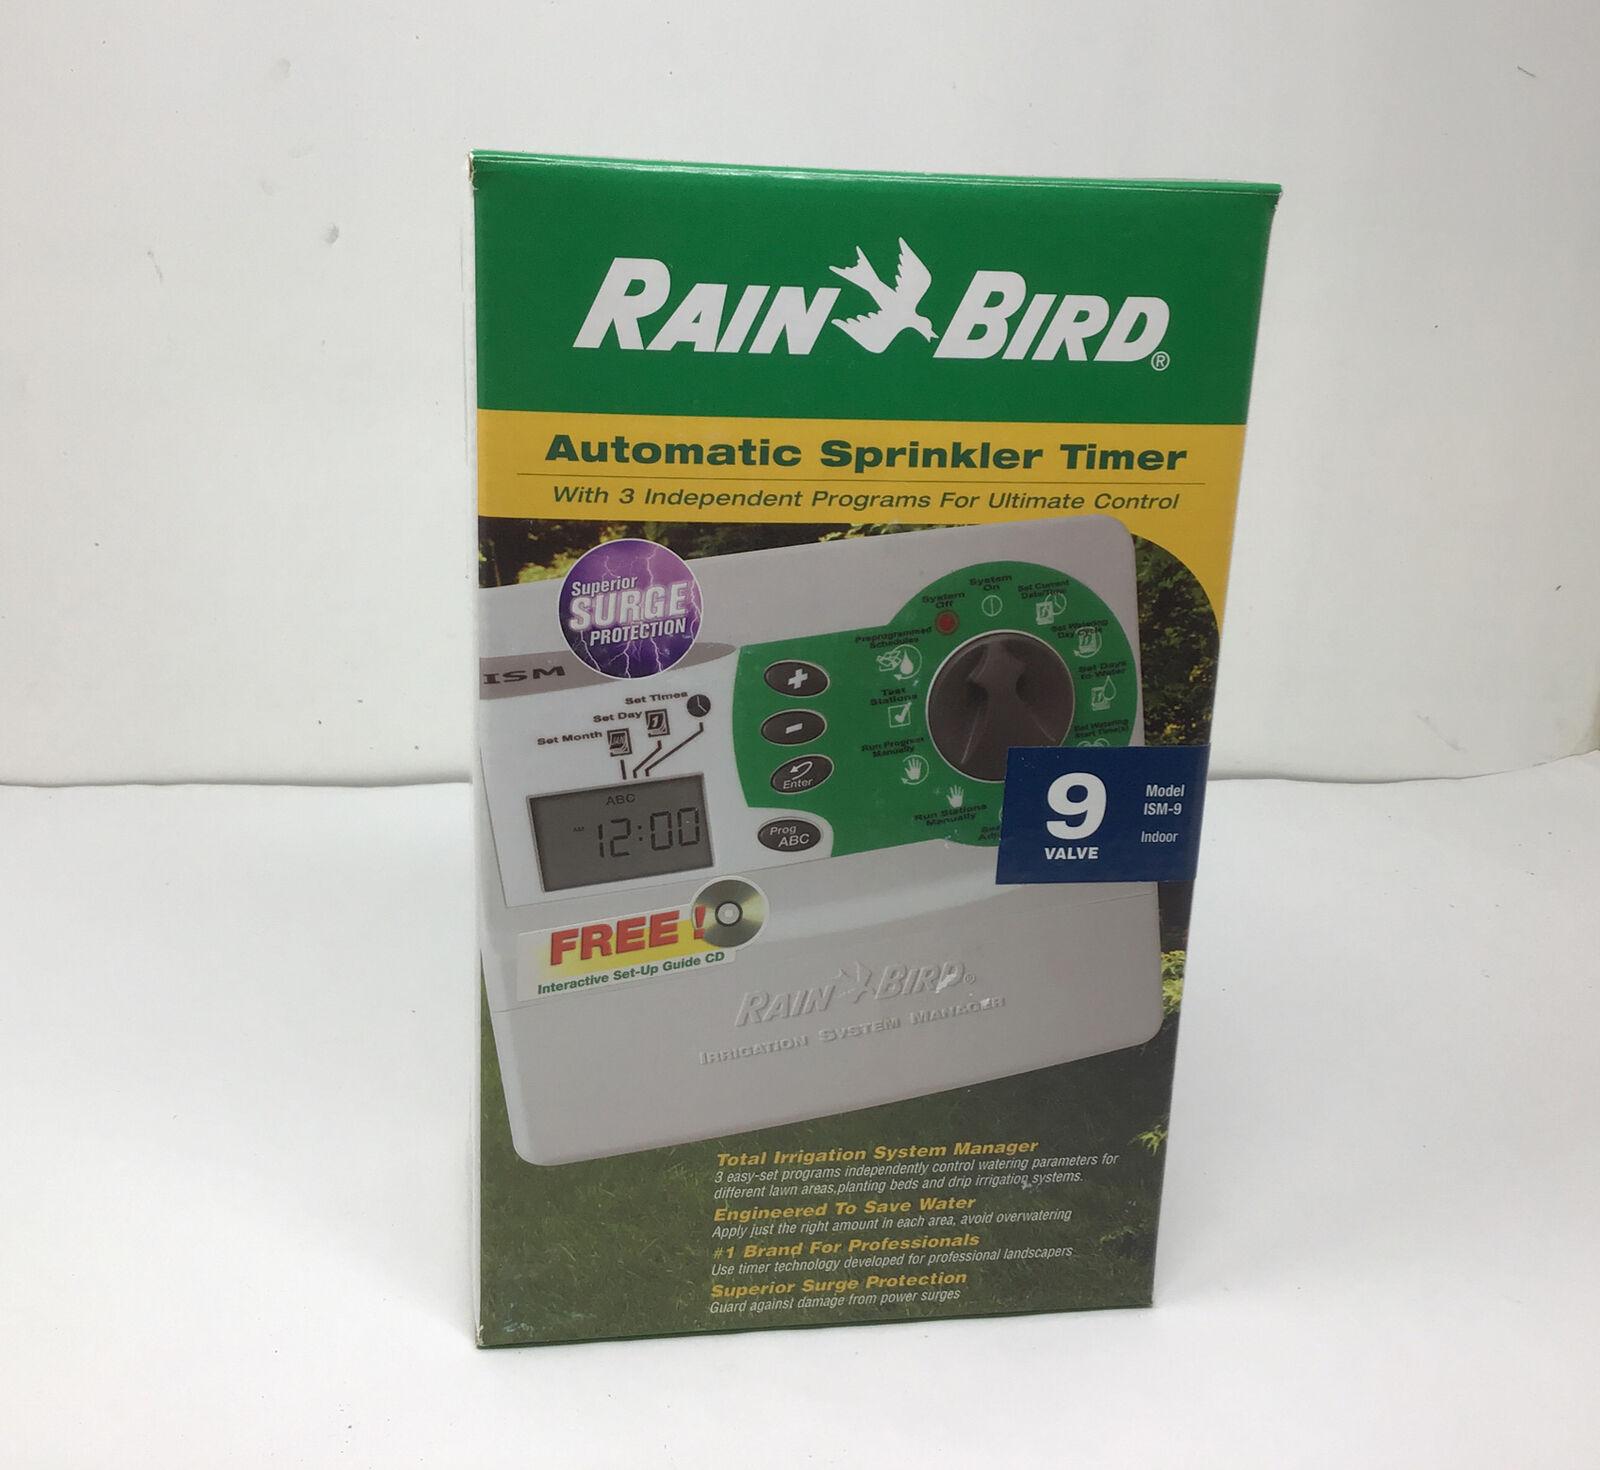 New Rain Bird Automatic Sprinkler Timer 9 Valve ISM-9 Indoor Irrigation System